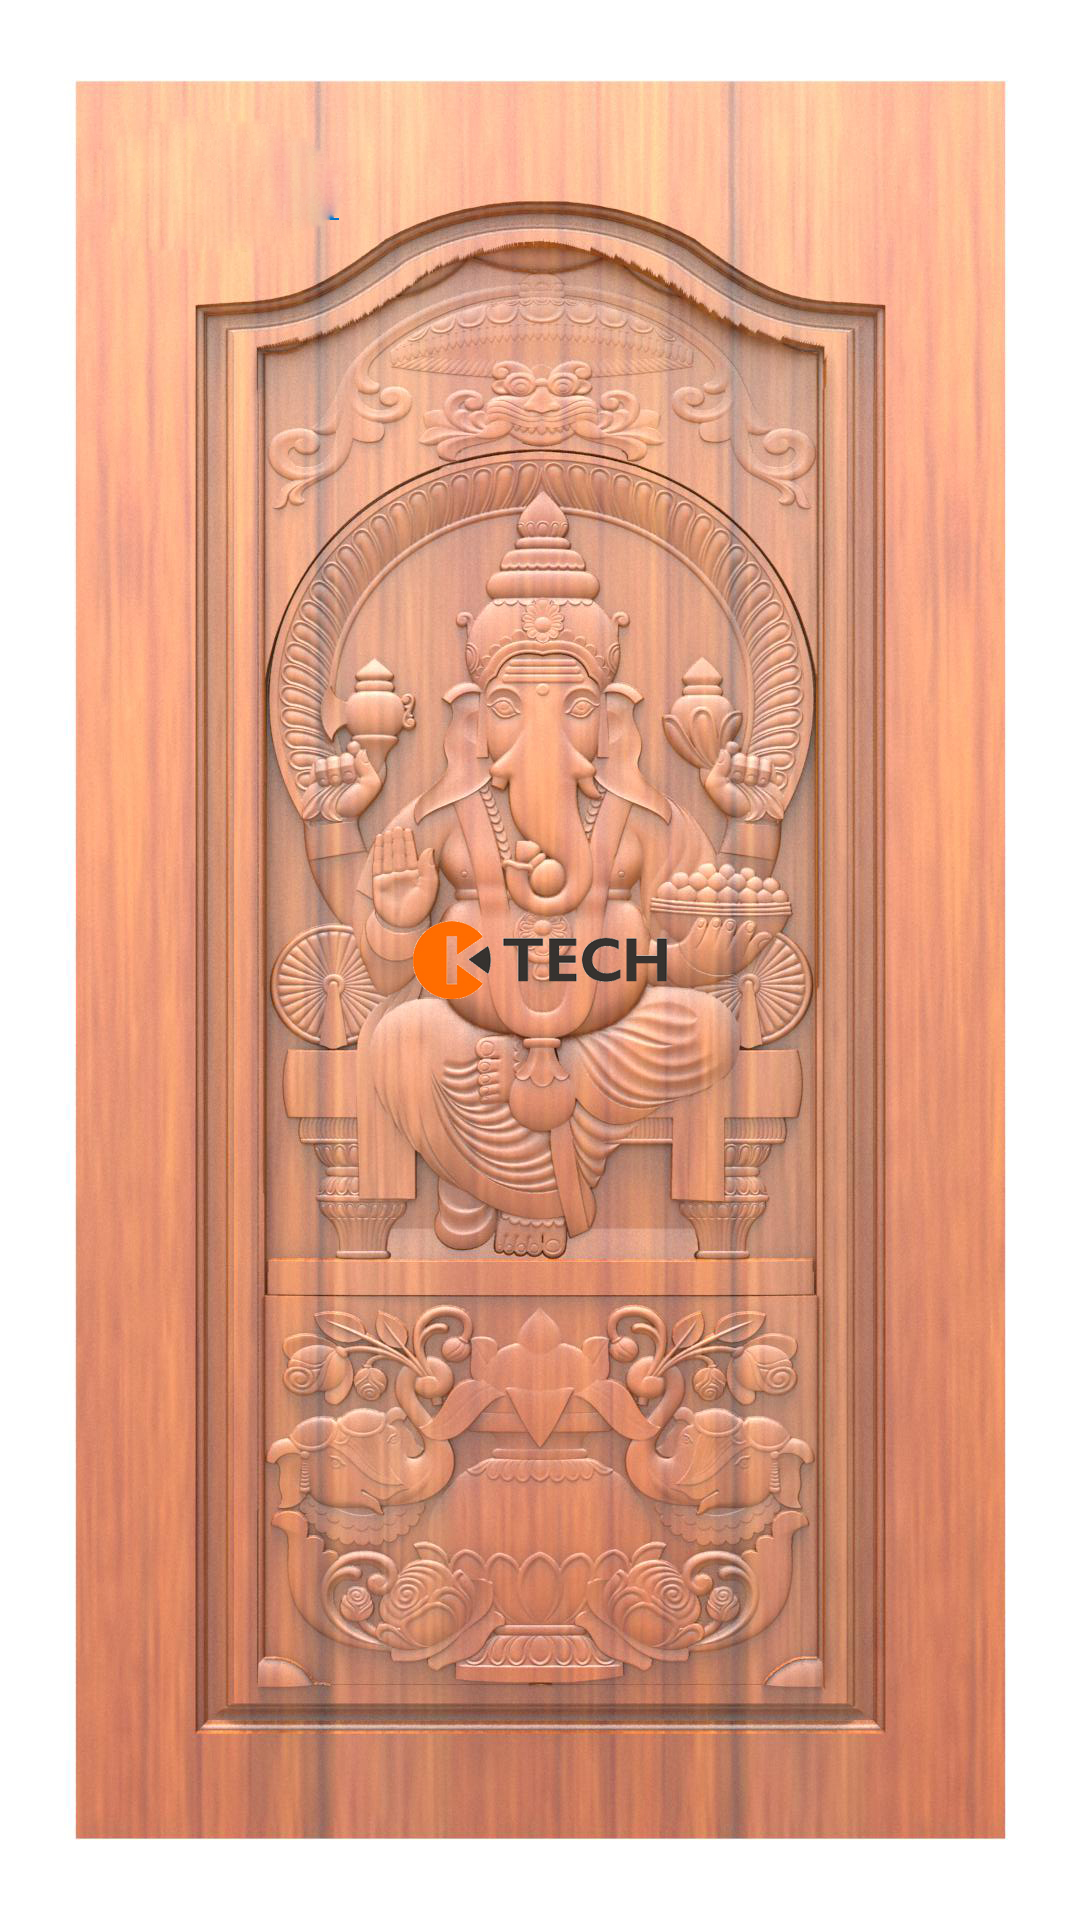 K-TECH CNC Doors Design 06